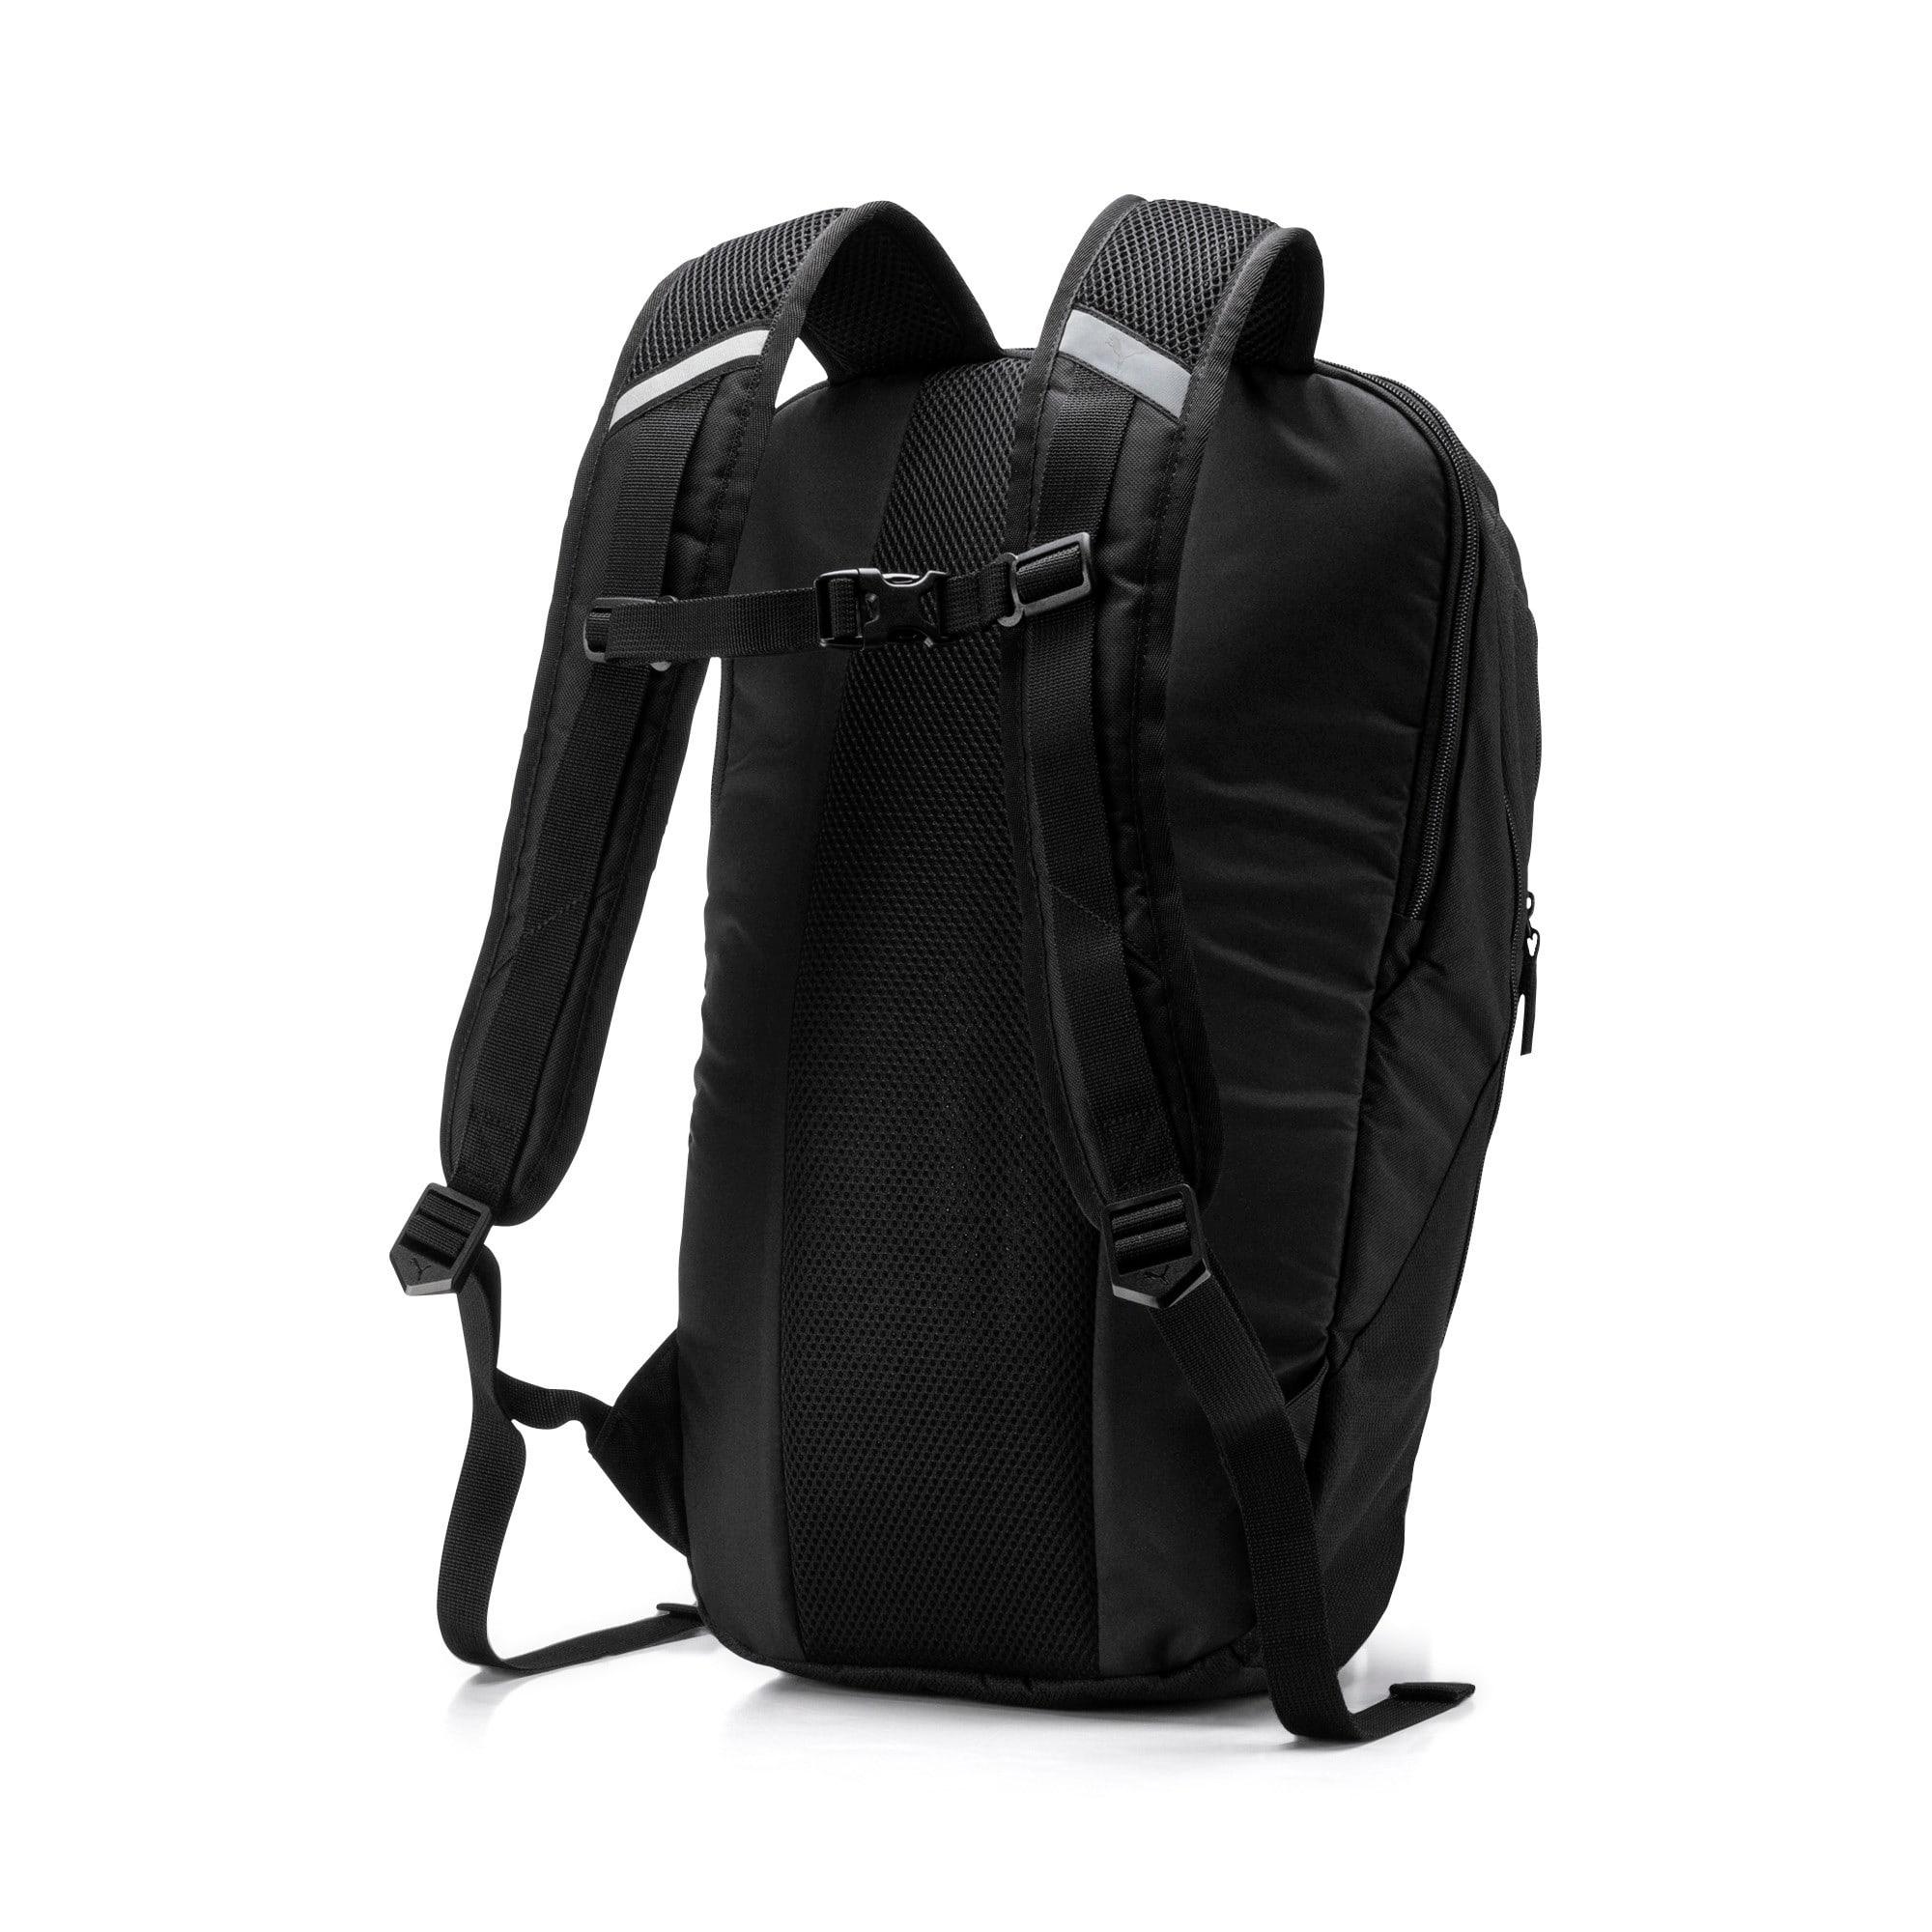 Thumbnail 2 of PUMA X Backpack, Puma Black, medium